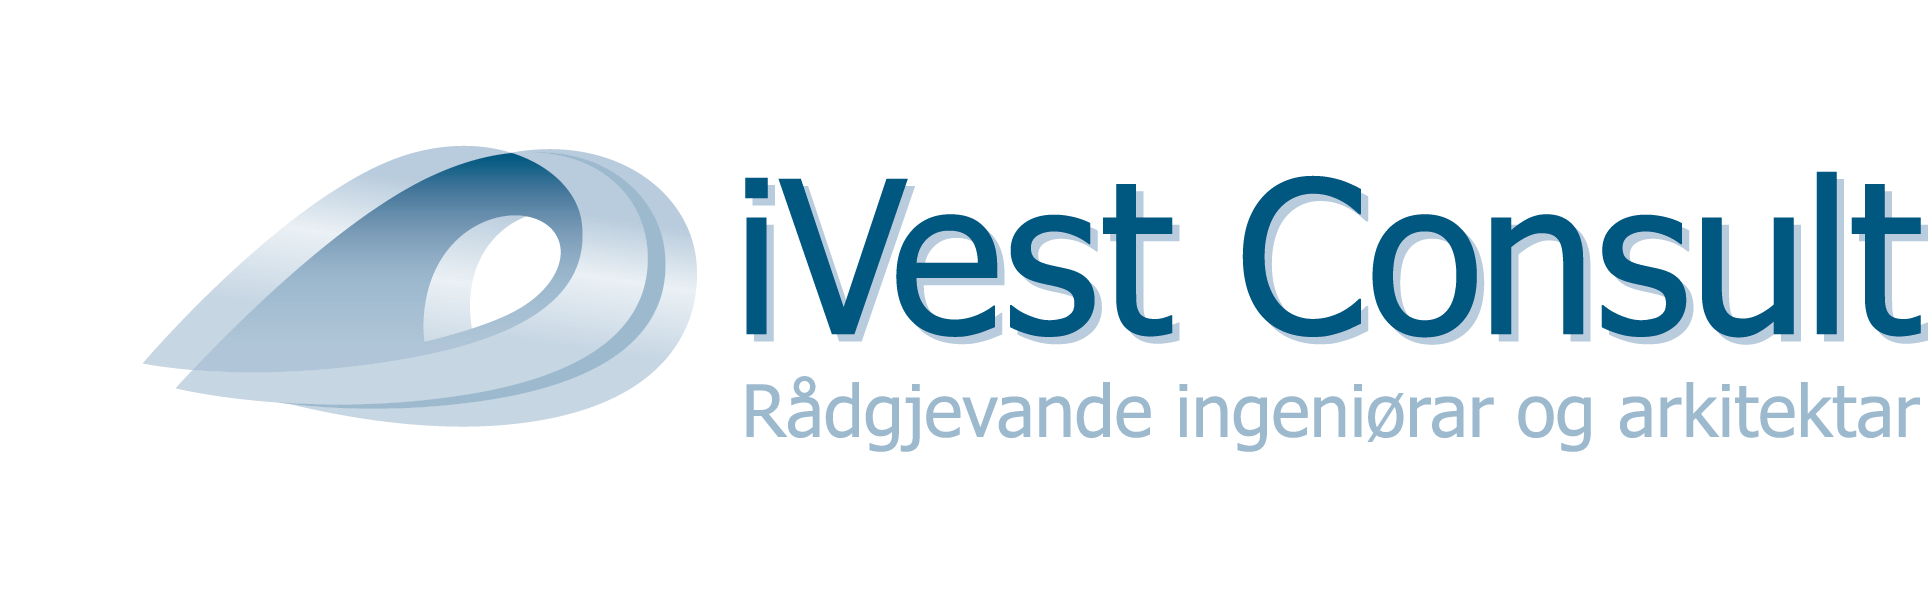 iVest logo_rådgjevande_ingeniørar_og_arkitektar.png